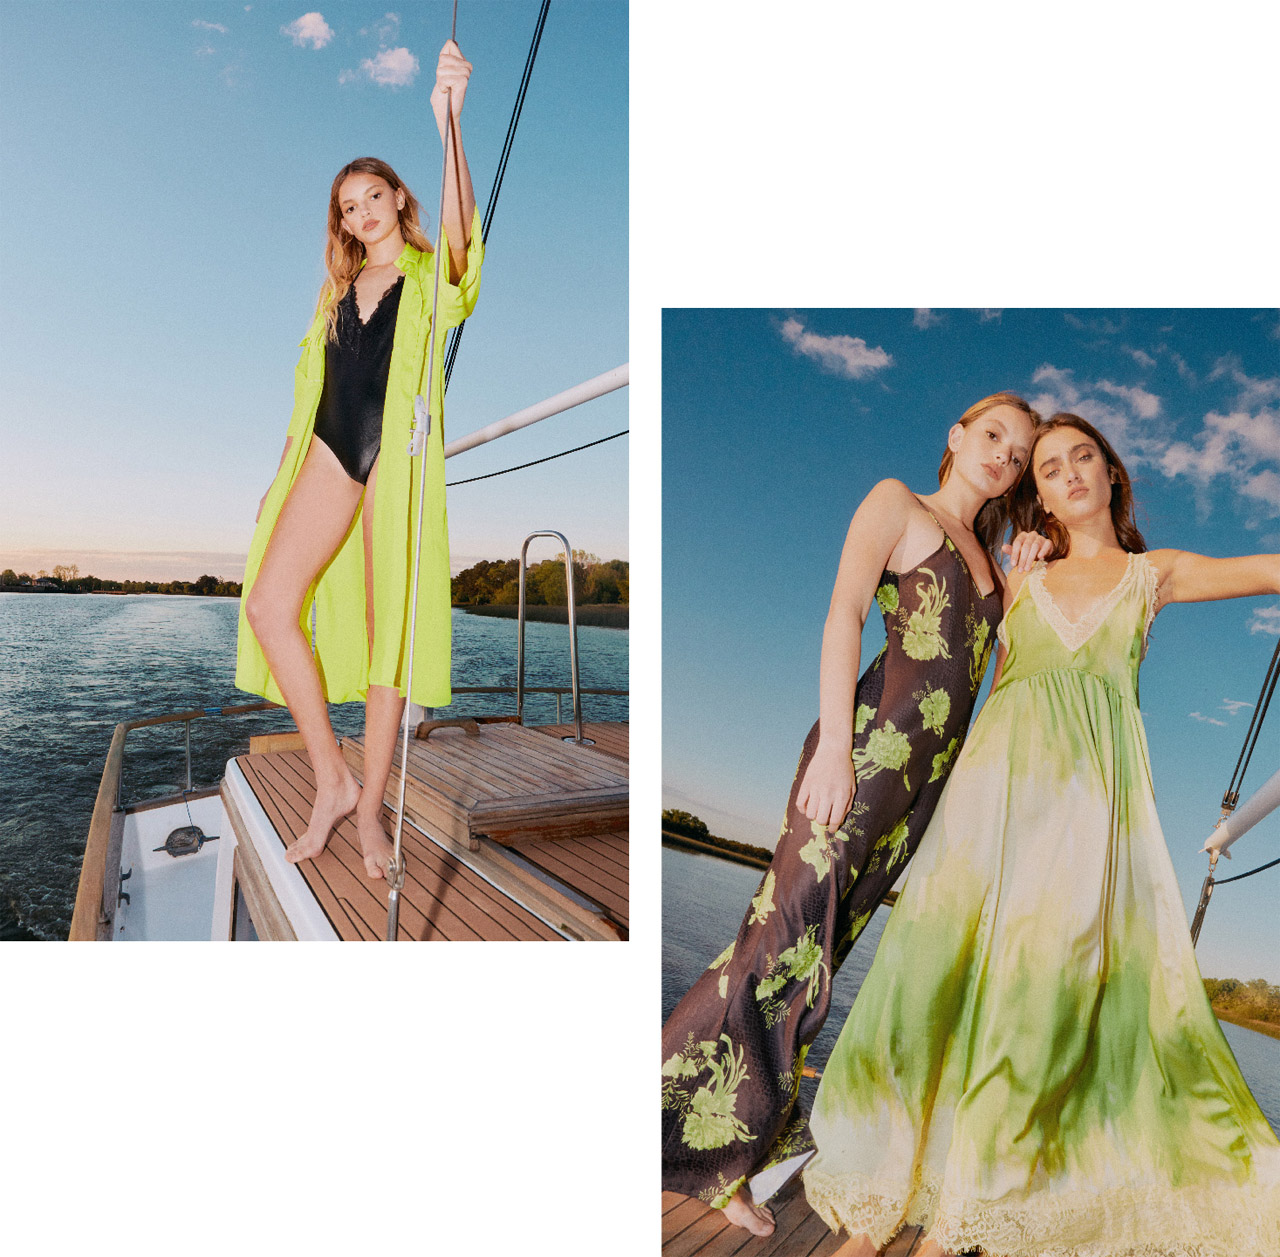 Túnicas de moda 2020. Moda verano 2020 looks para lucir en la playa en días de verano.